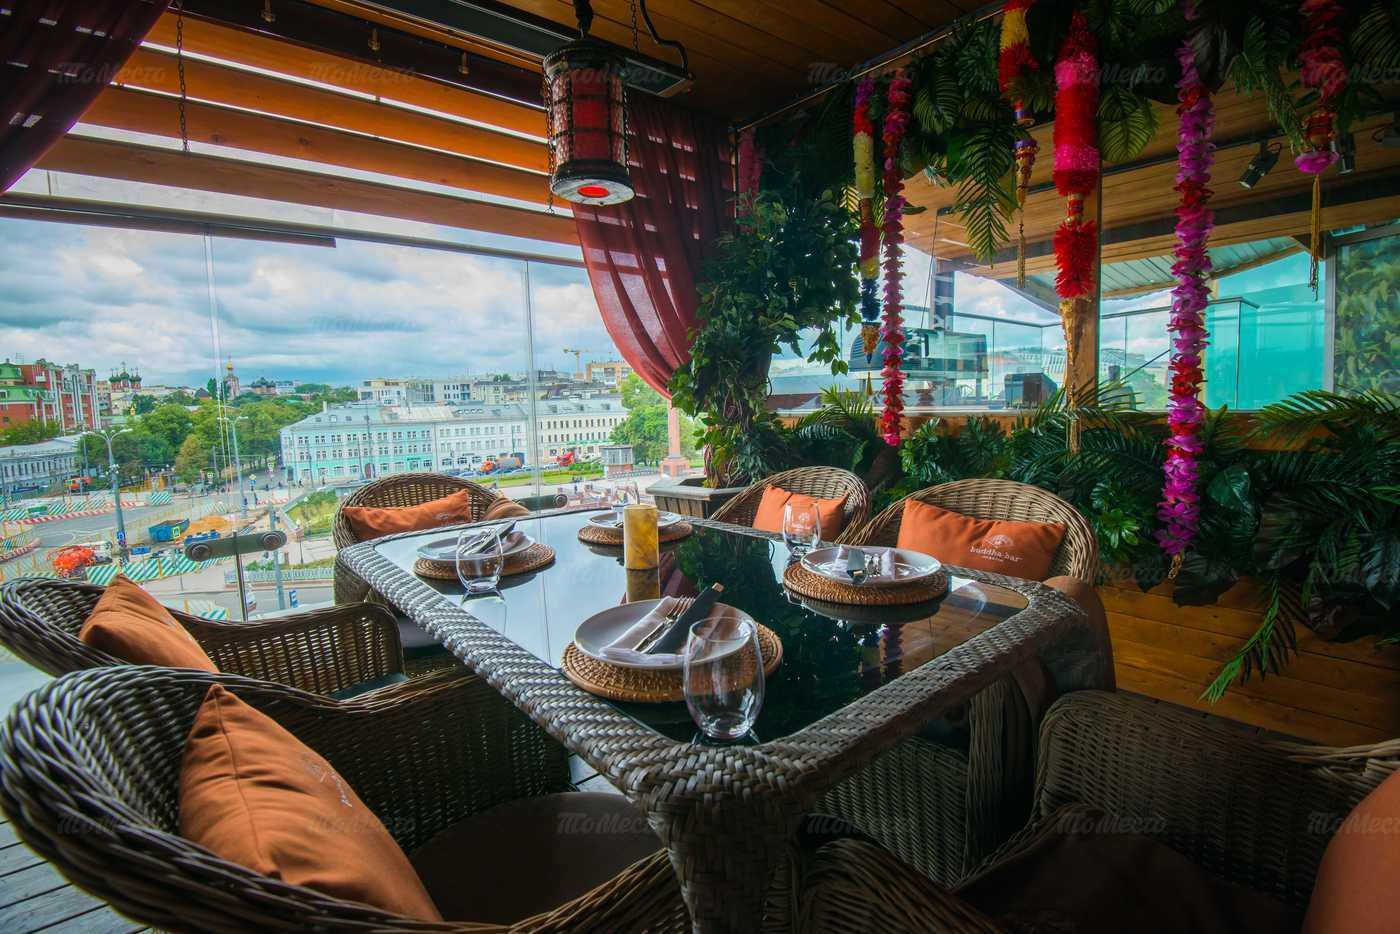 Меню бара, ночного клуба, ресторана Будда Бар Москва (Buddha Bar Moscow) на Цветном бульваре